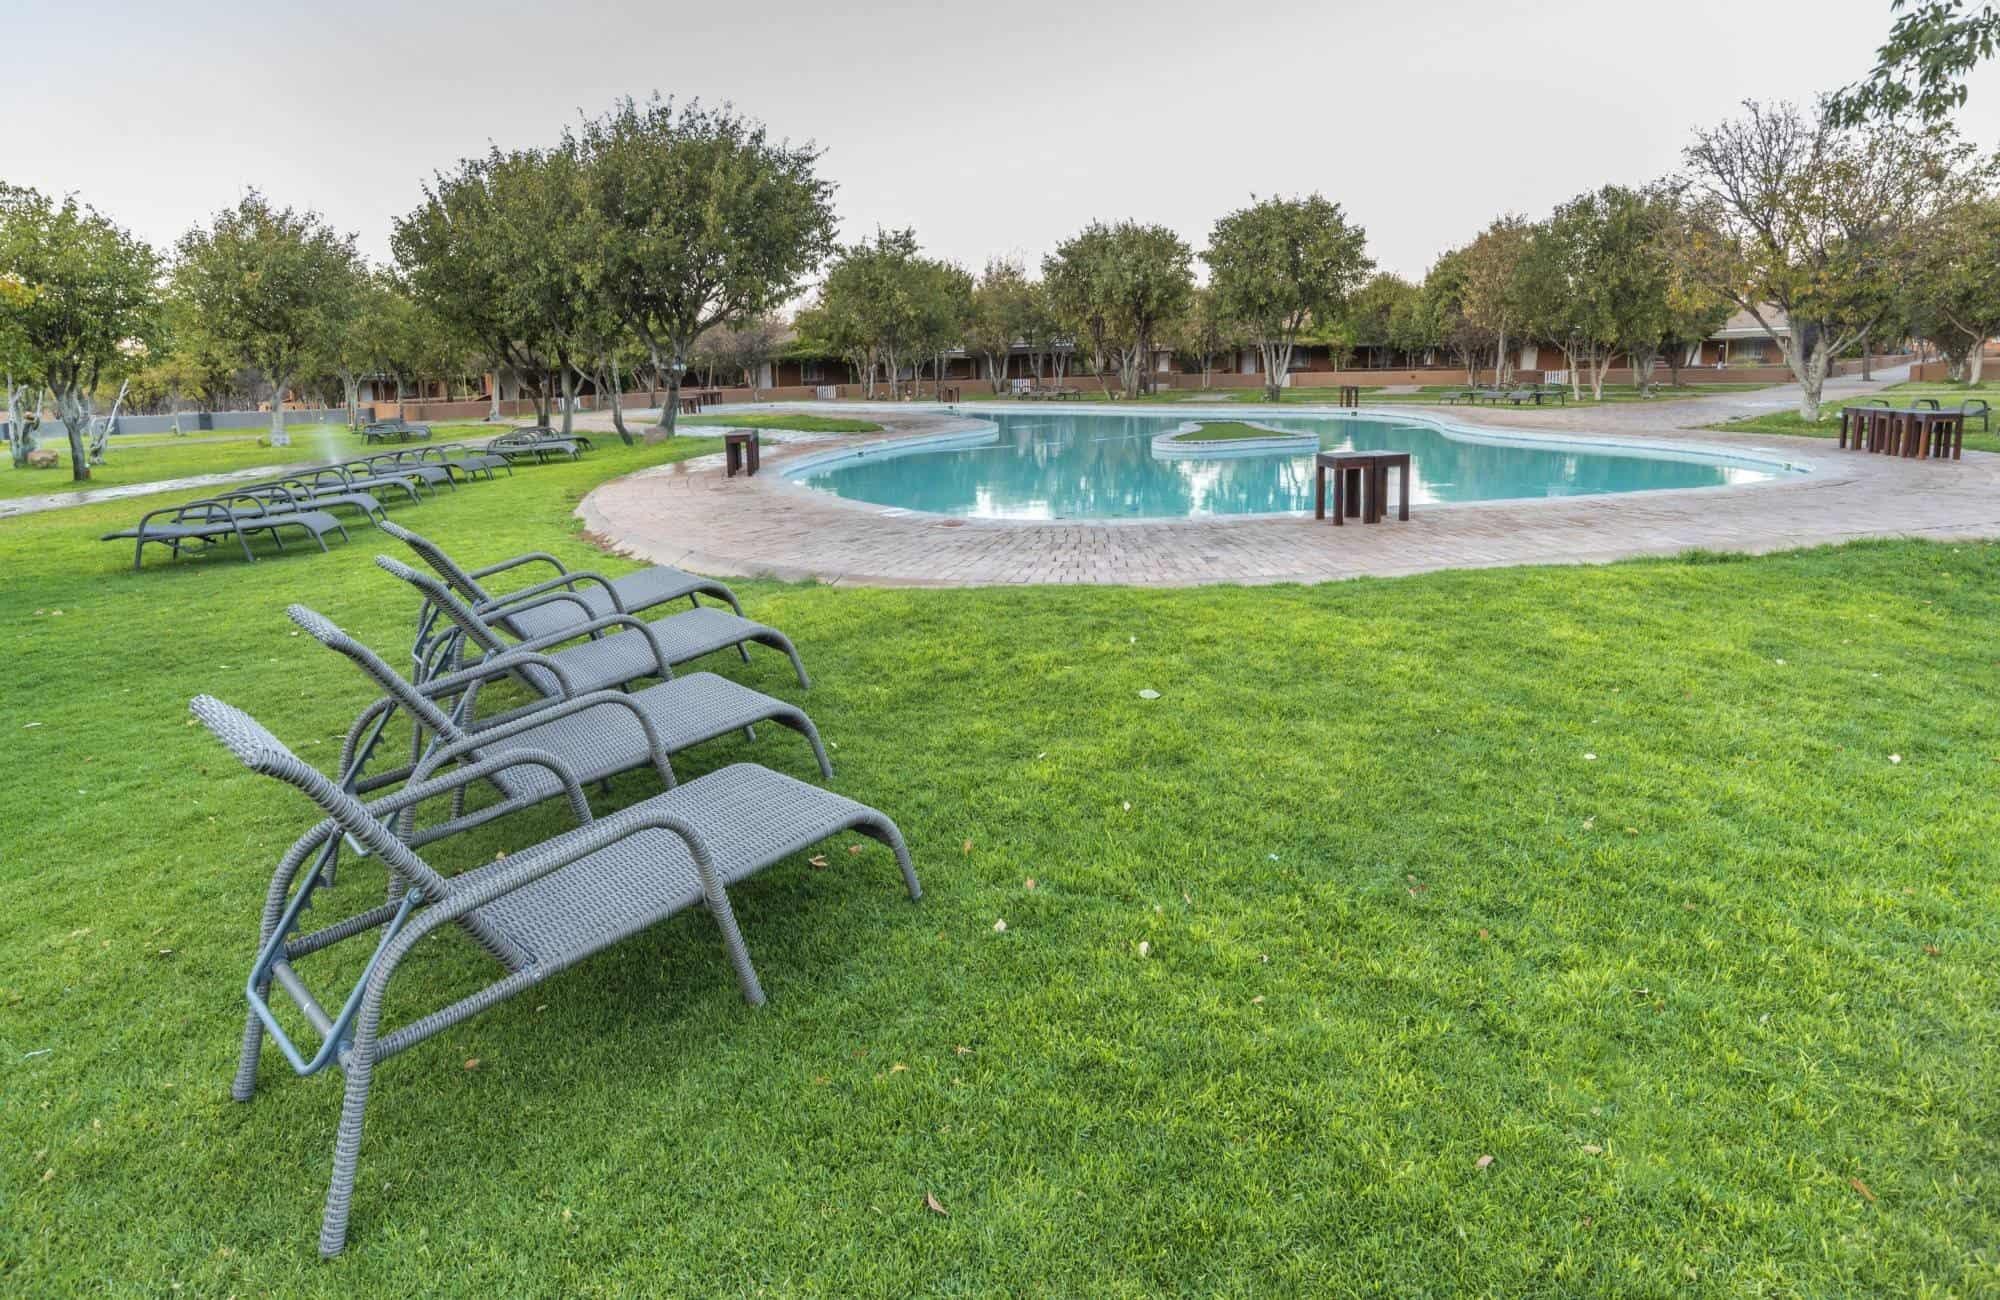 Damaraland pool side view